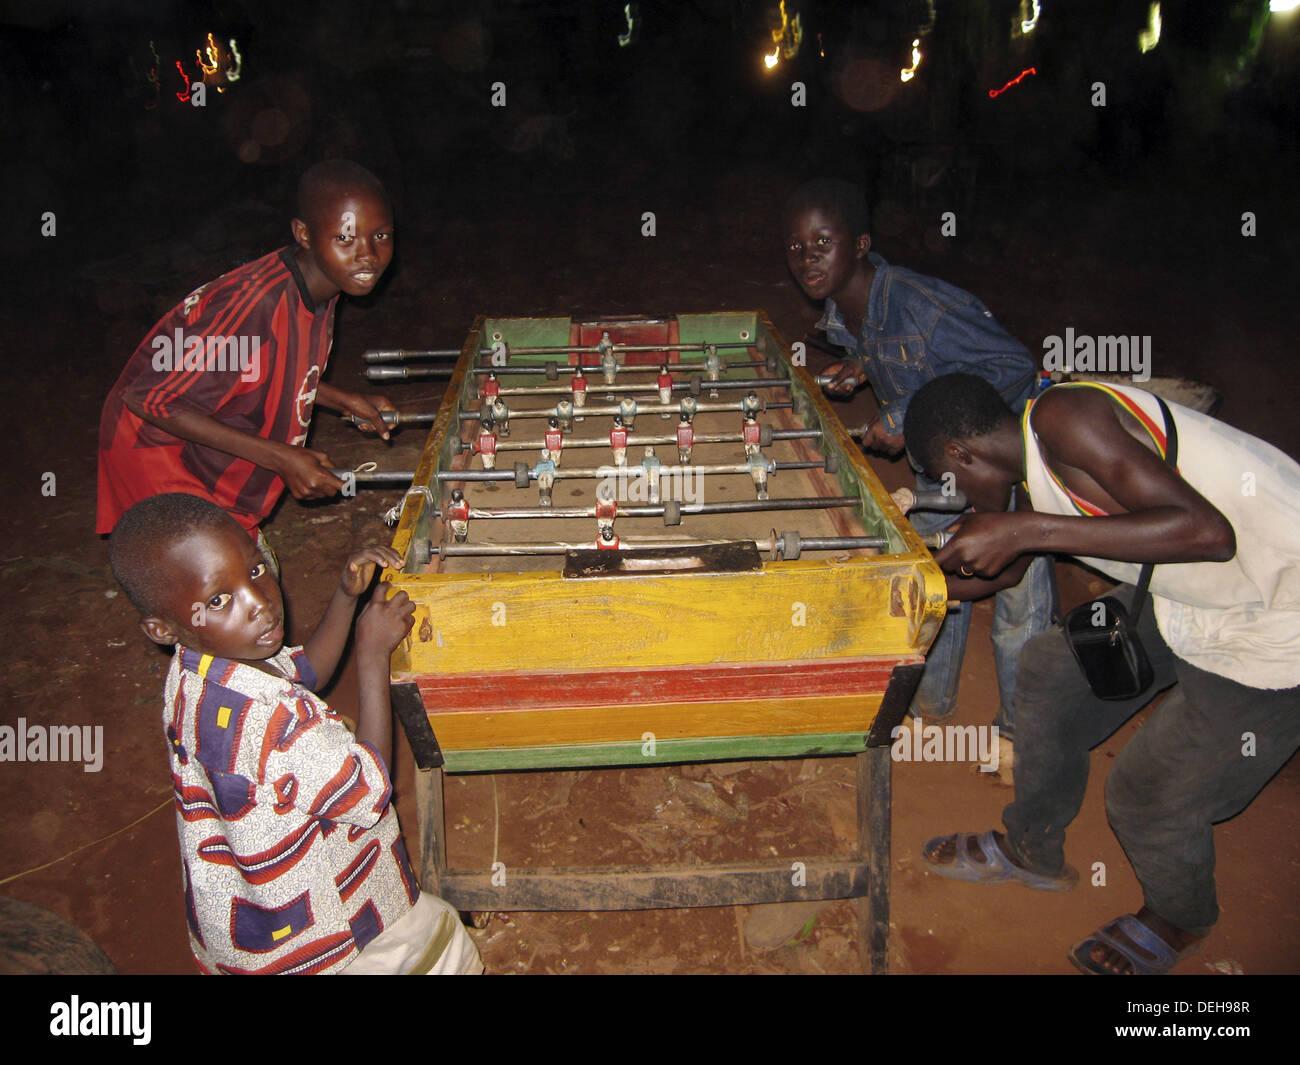 Senoufo children playing table football at night, Banfora. Burkina Faso - Stock Image